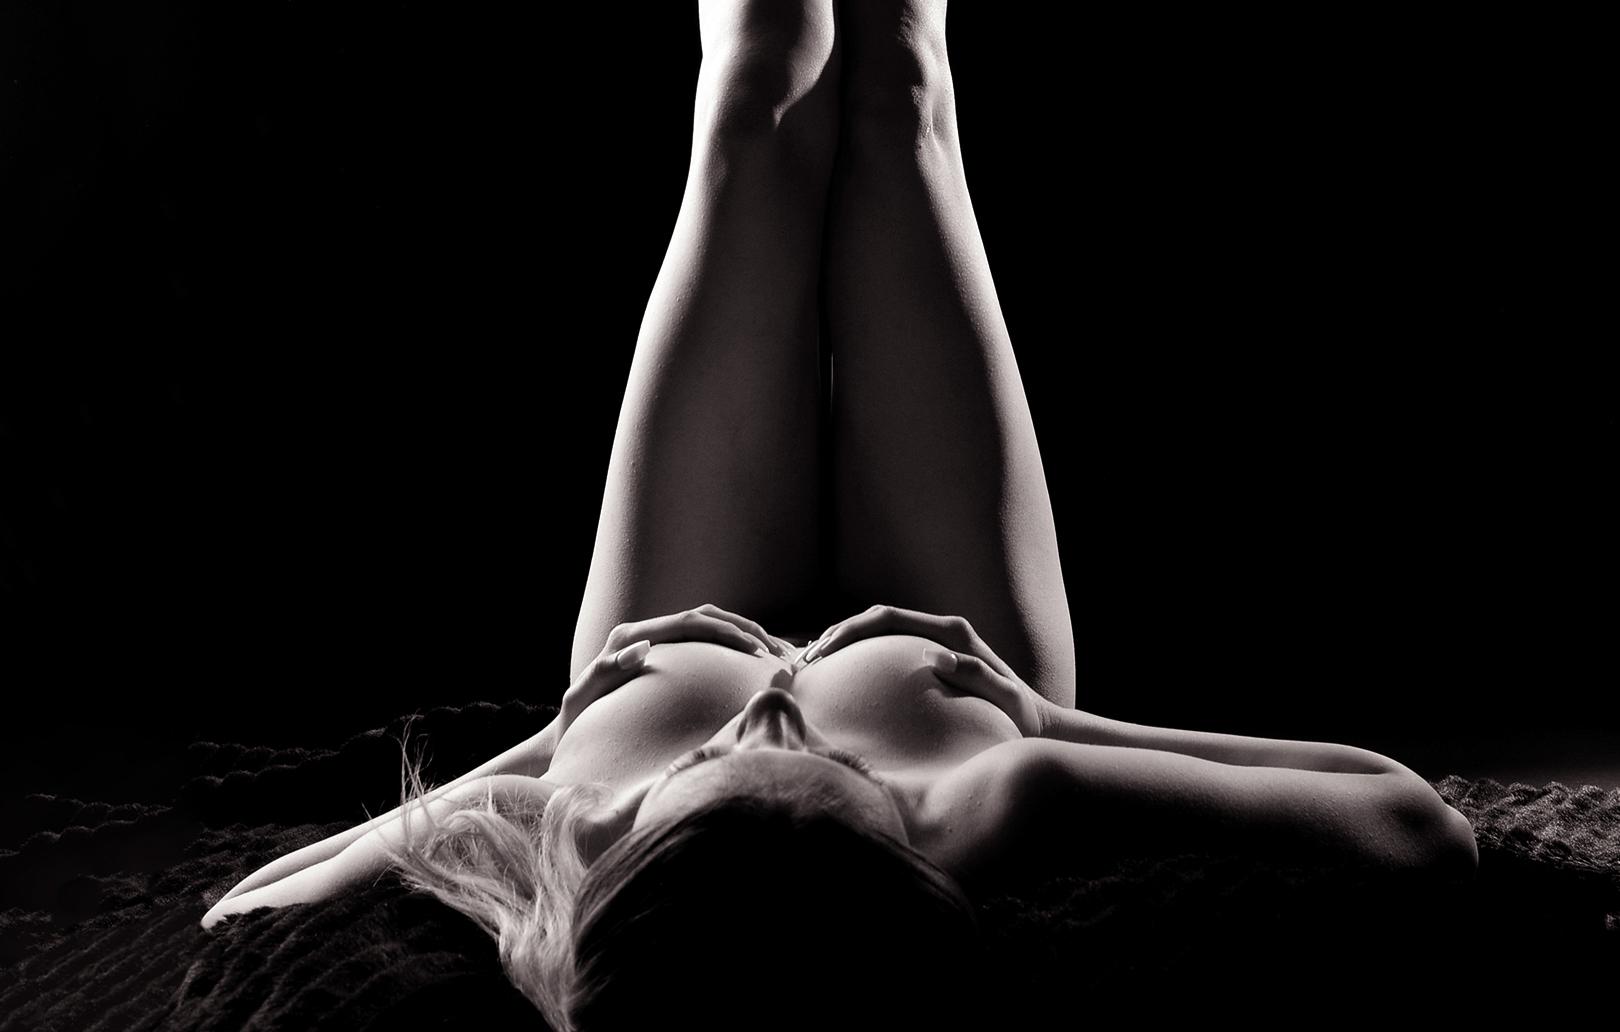 erotisches-fotoshooting-hannover-bg21610453659